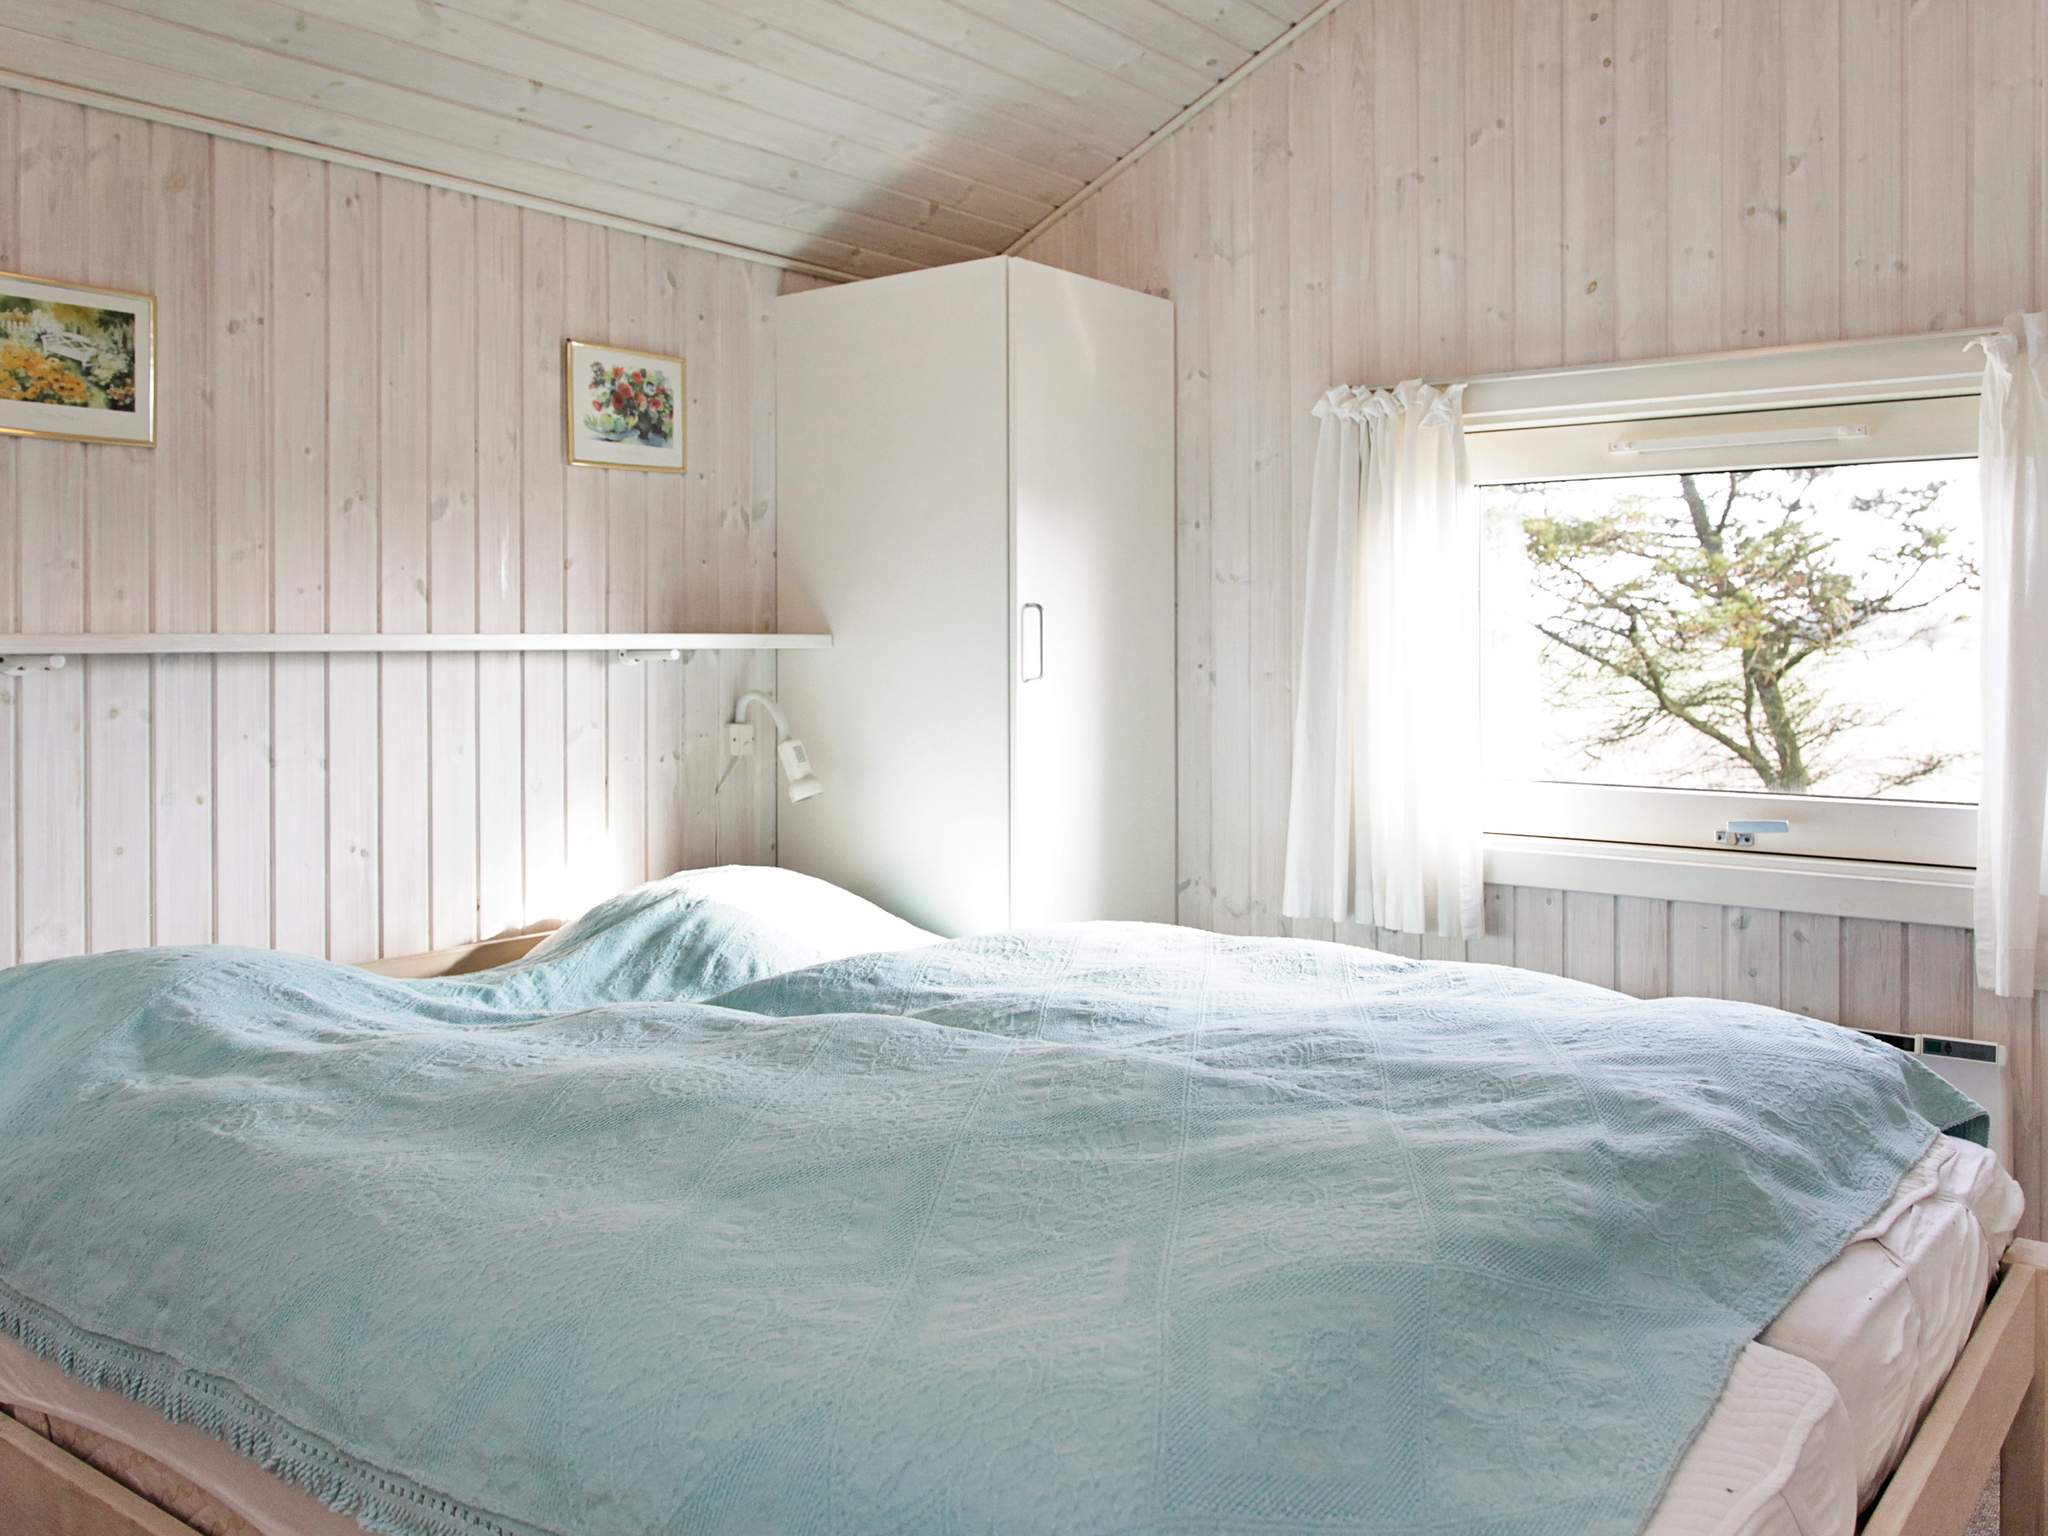 Ferienhaus Vesteregn (82671), Humble, , Langeland, Dänemark, Bild 11